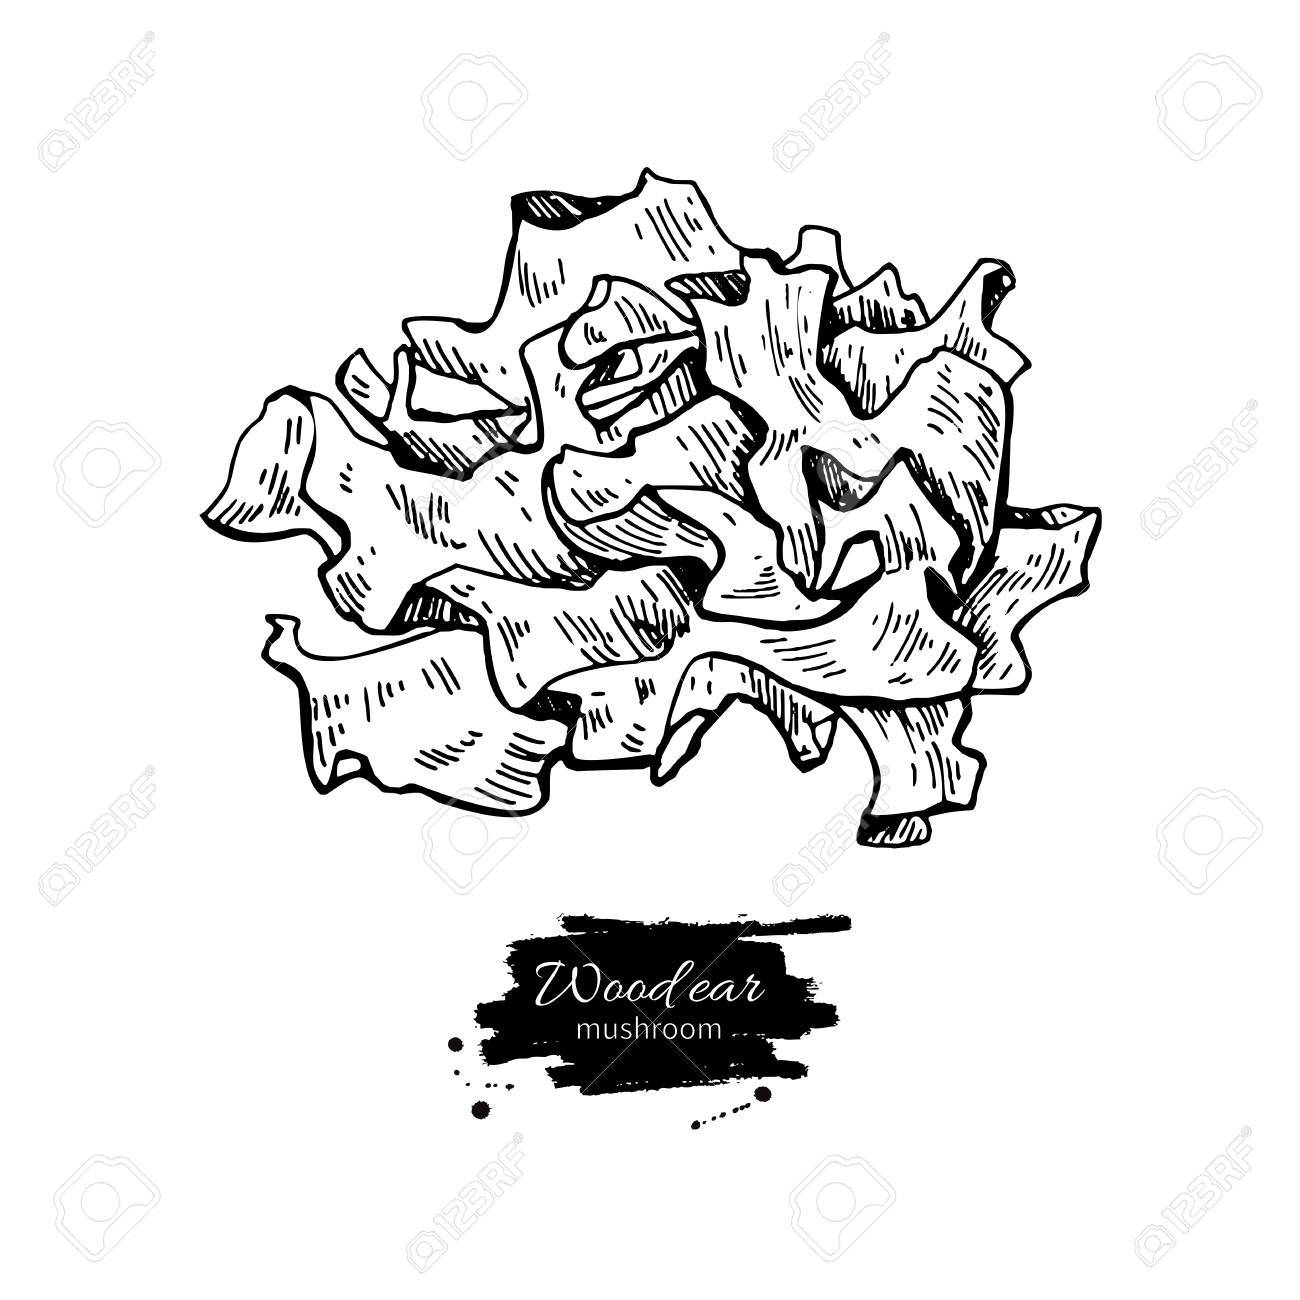 1300x1300 Wood Ear Mushroom Hand Drawn Vector Illustration. Sketch Food